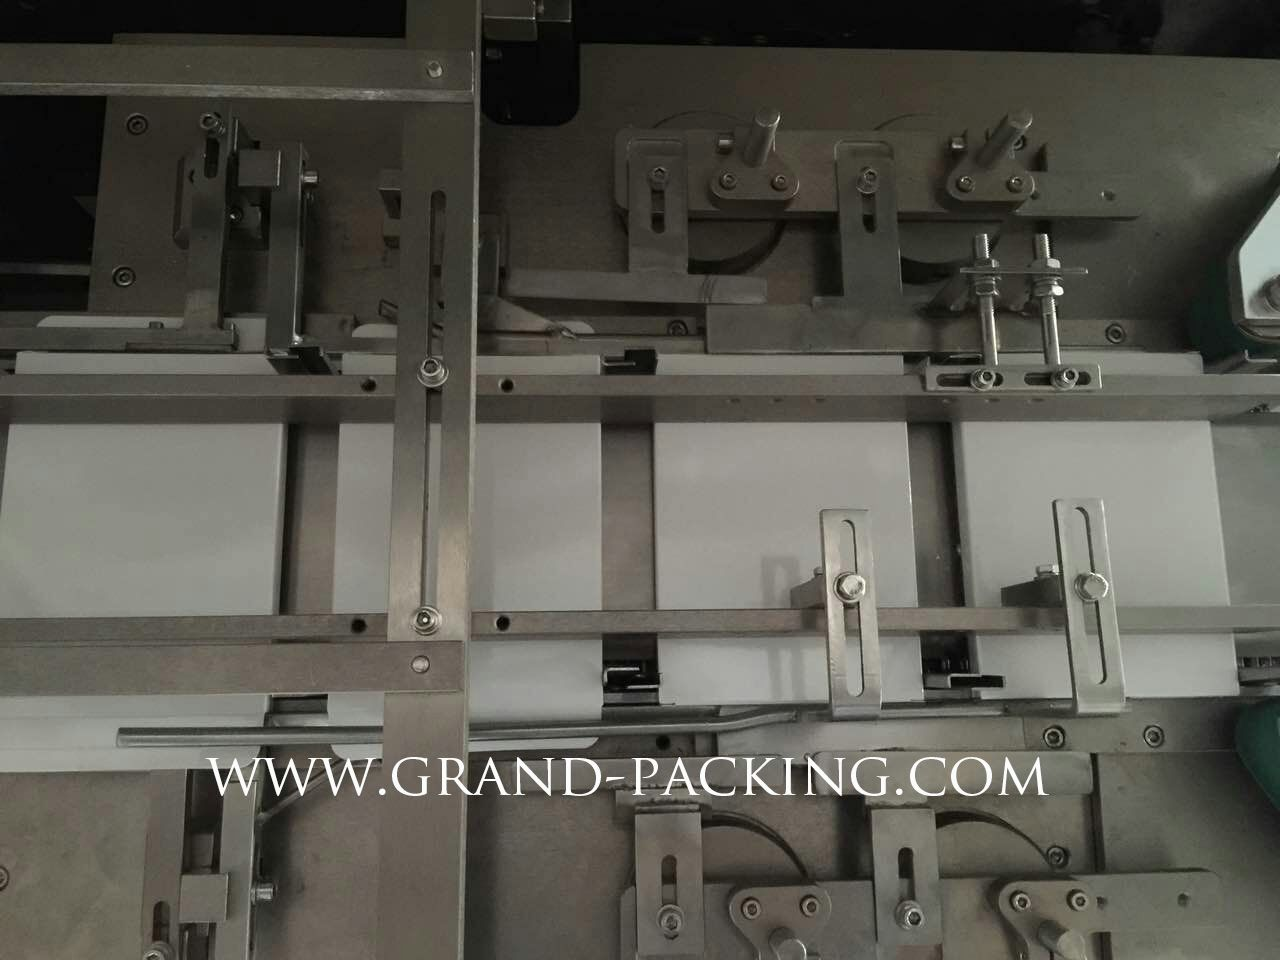 Carton Sealer Carton Packing Machine Box Sealer Box Sealer Carton Sealing Machine Carton Box Manufacturing Machine Automatic Electrical Components Bottle